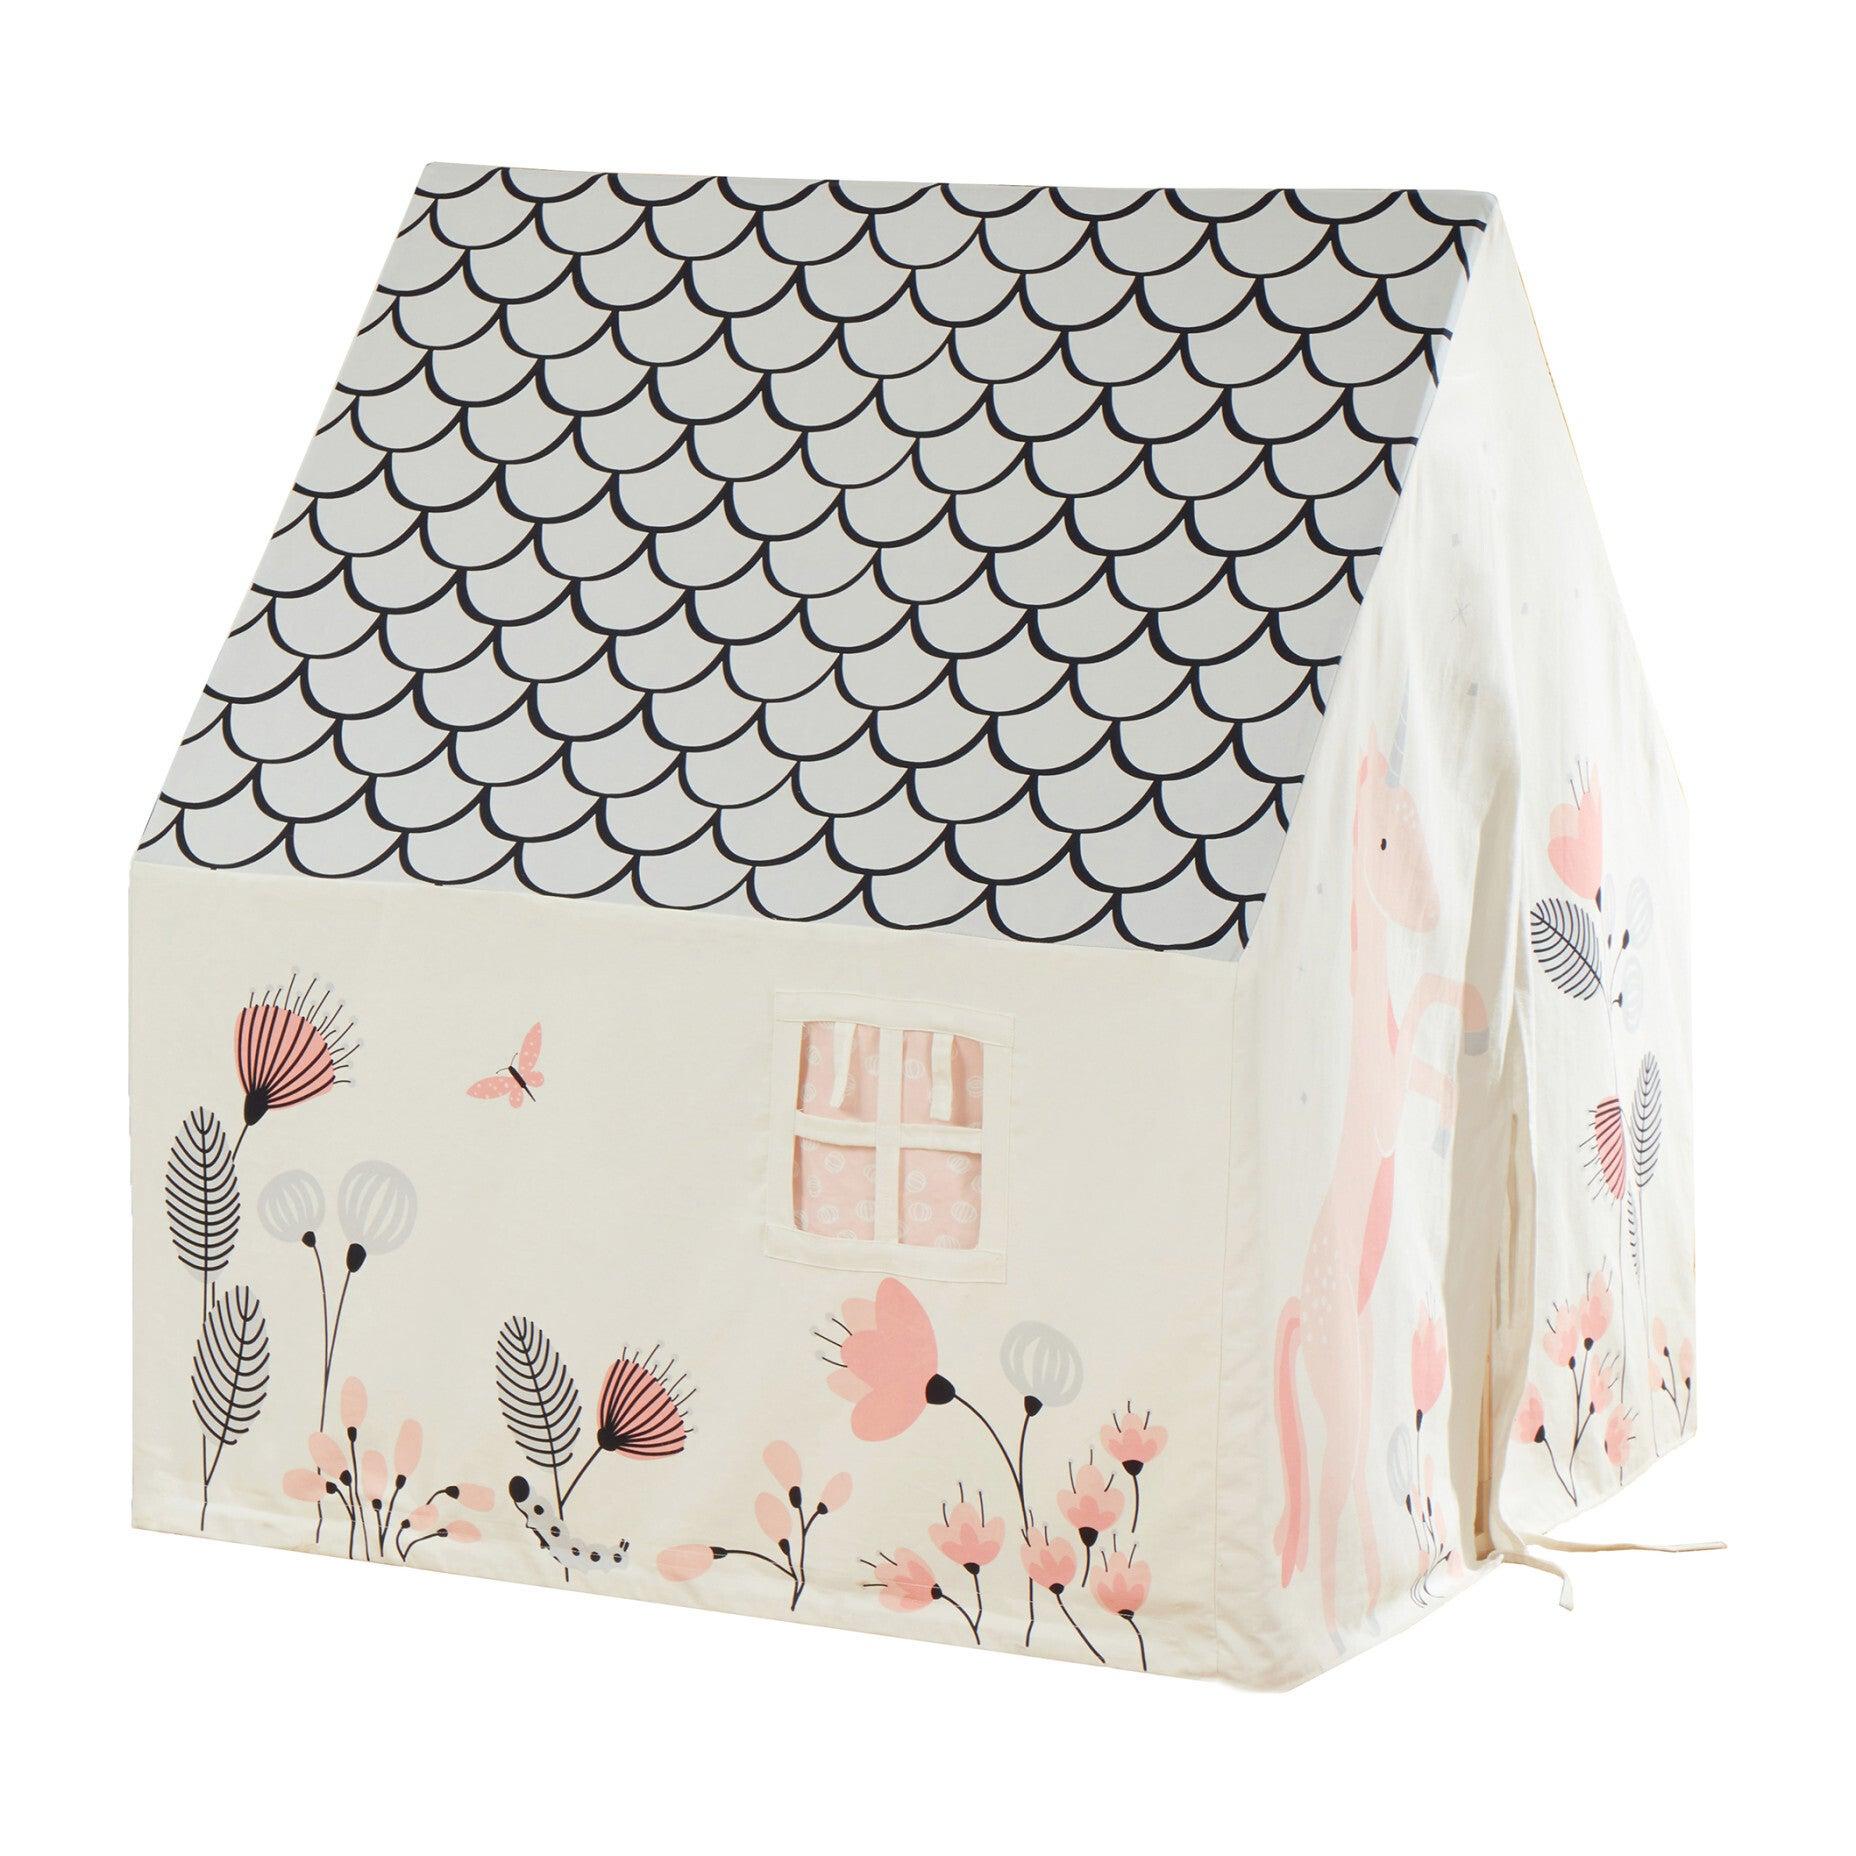 Unicorn Play House